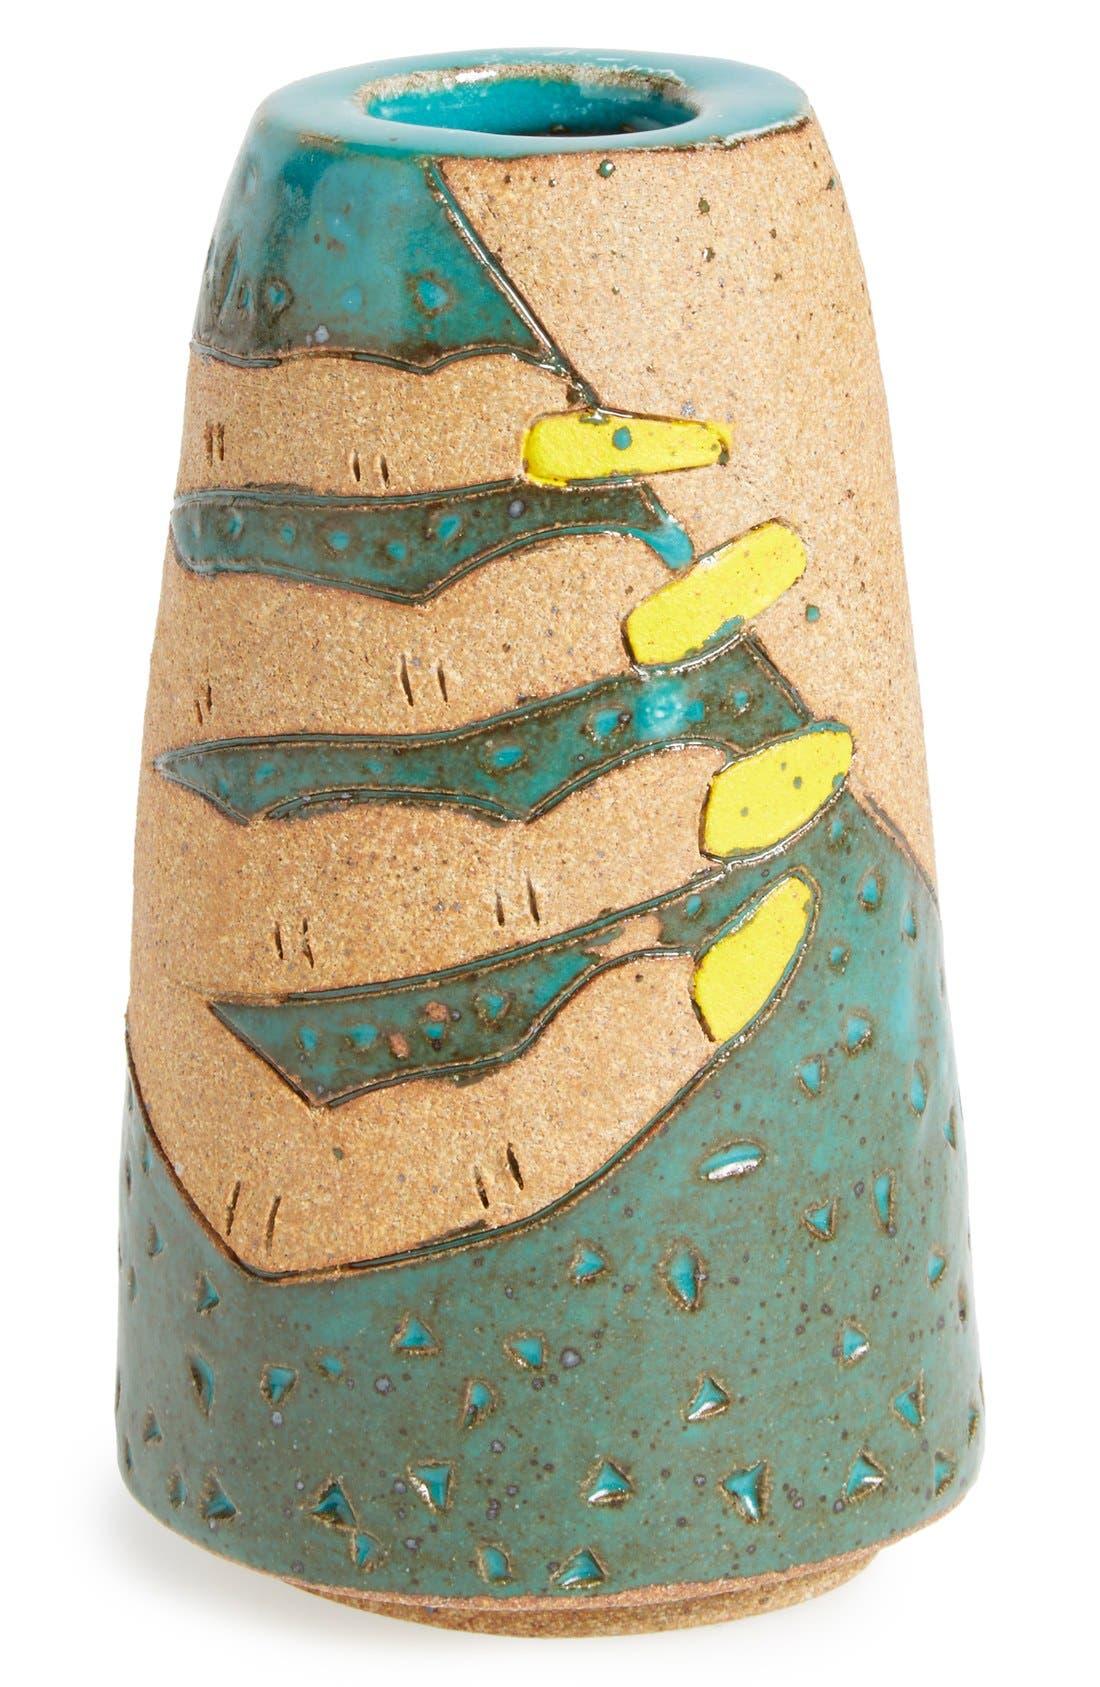 BZIPPY & CO. 'Nails' Handmade Ceramic Vase